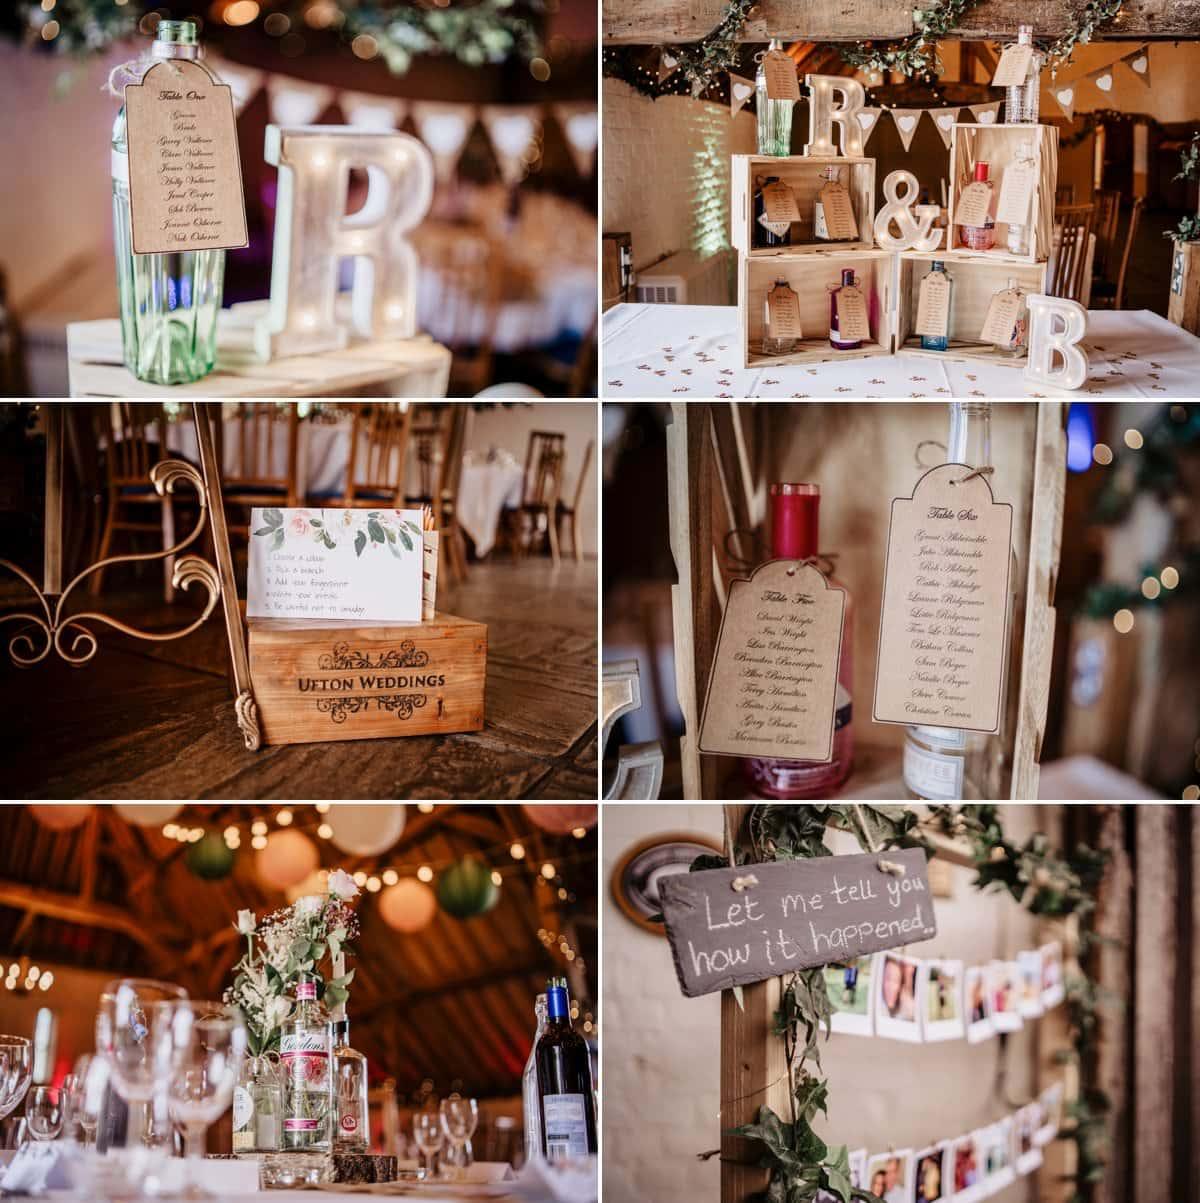 Ufton Court Wedding Barn